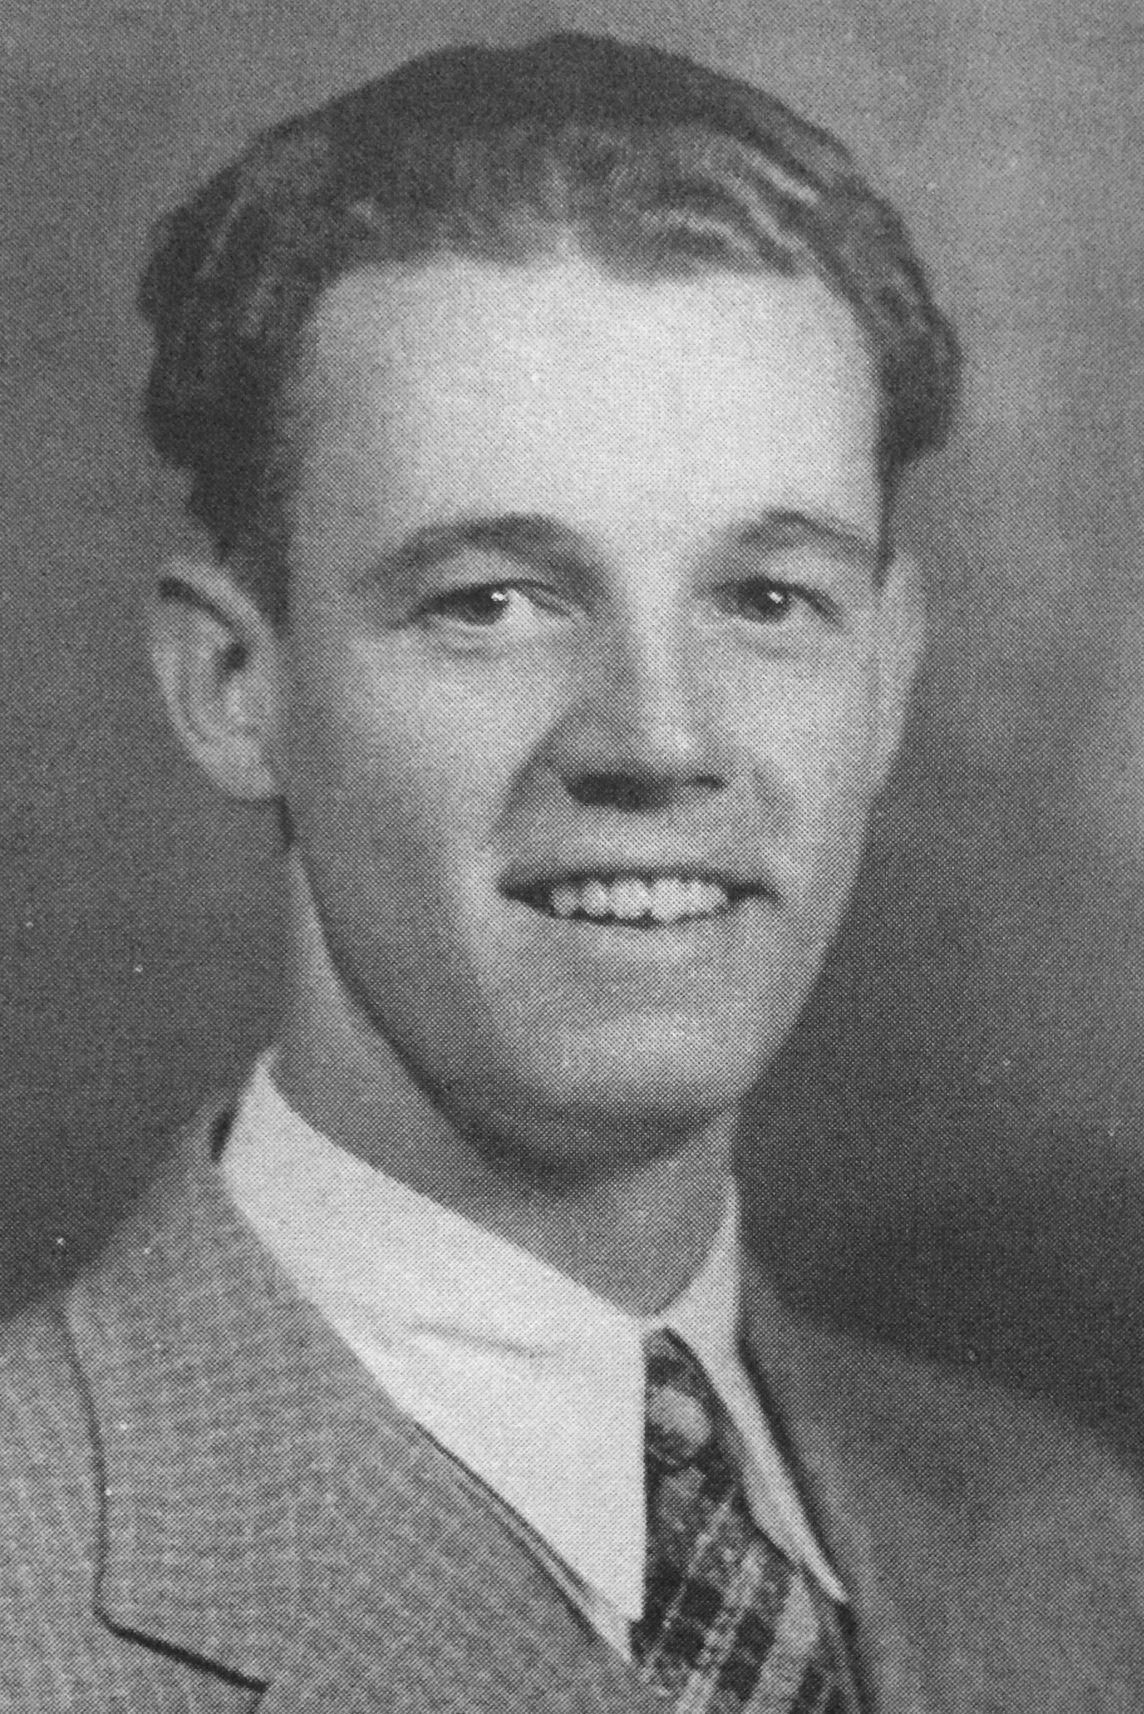 Barton, Donald K